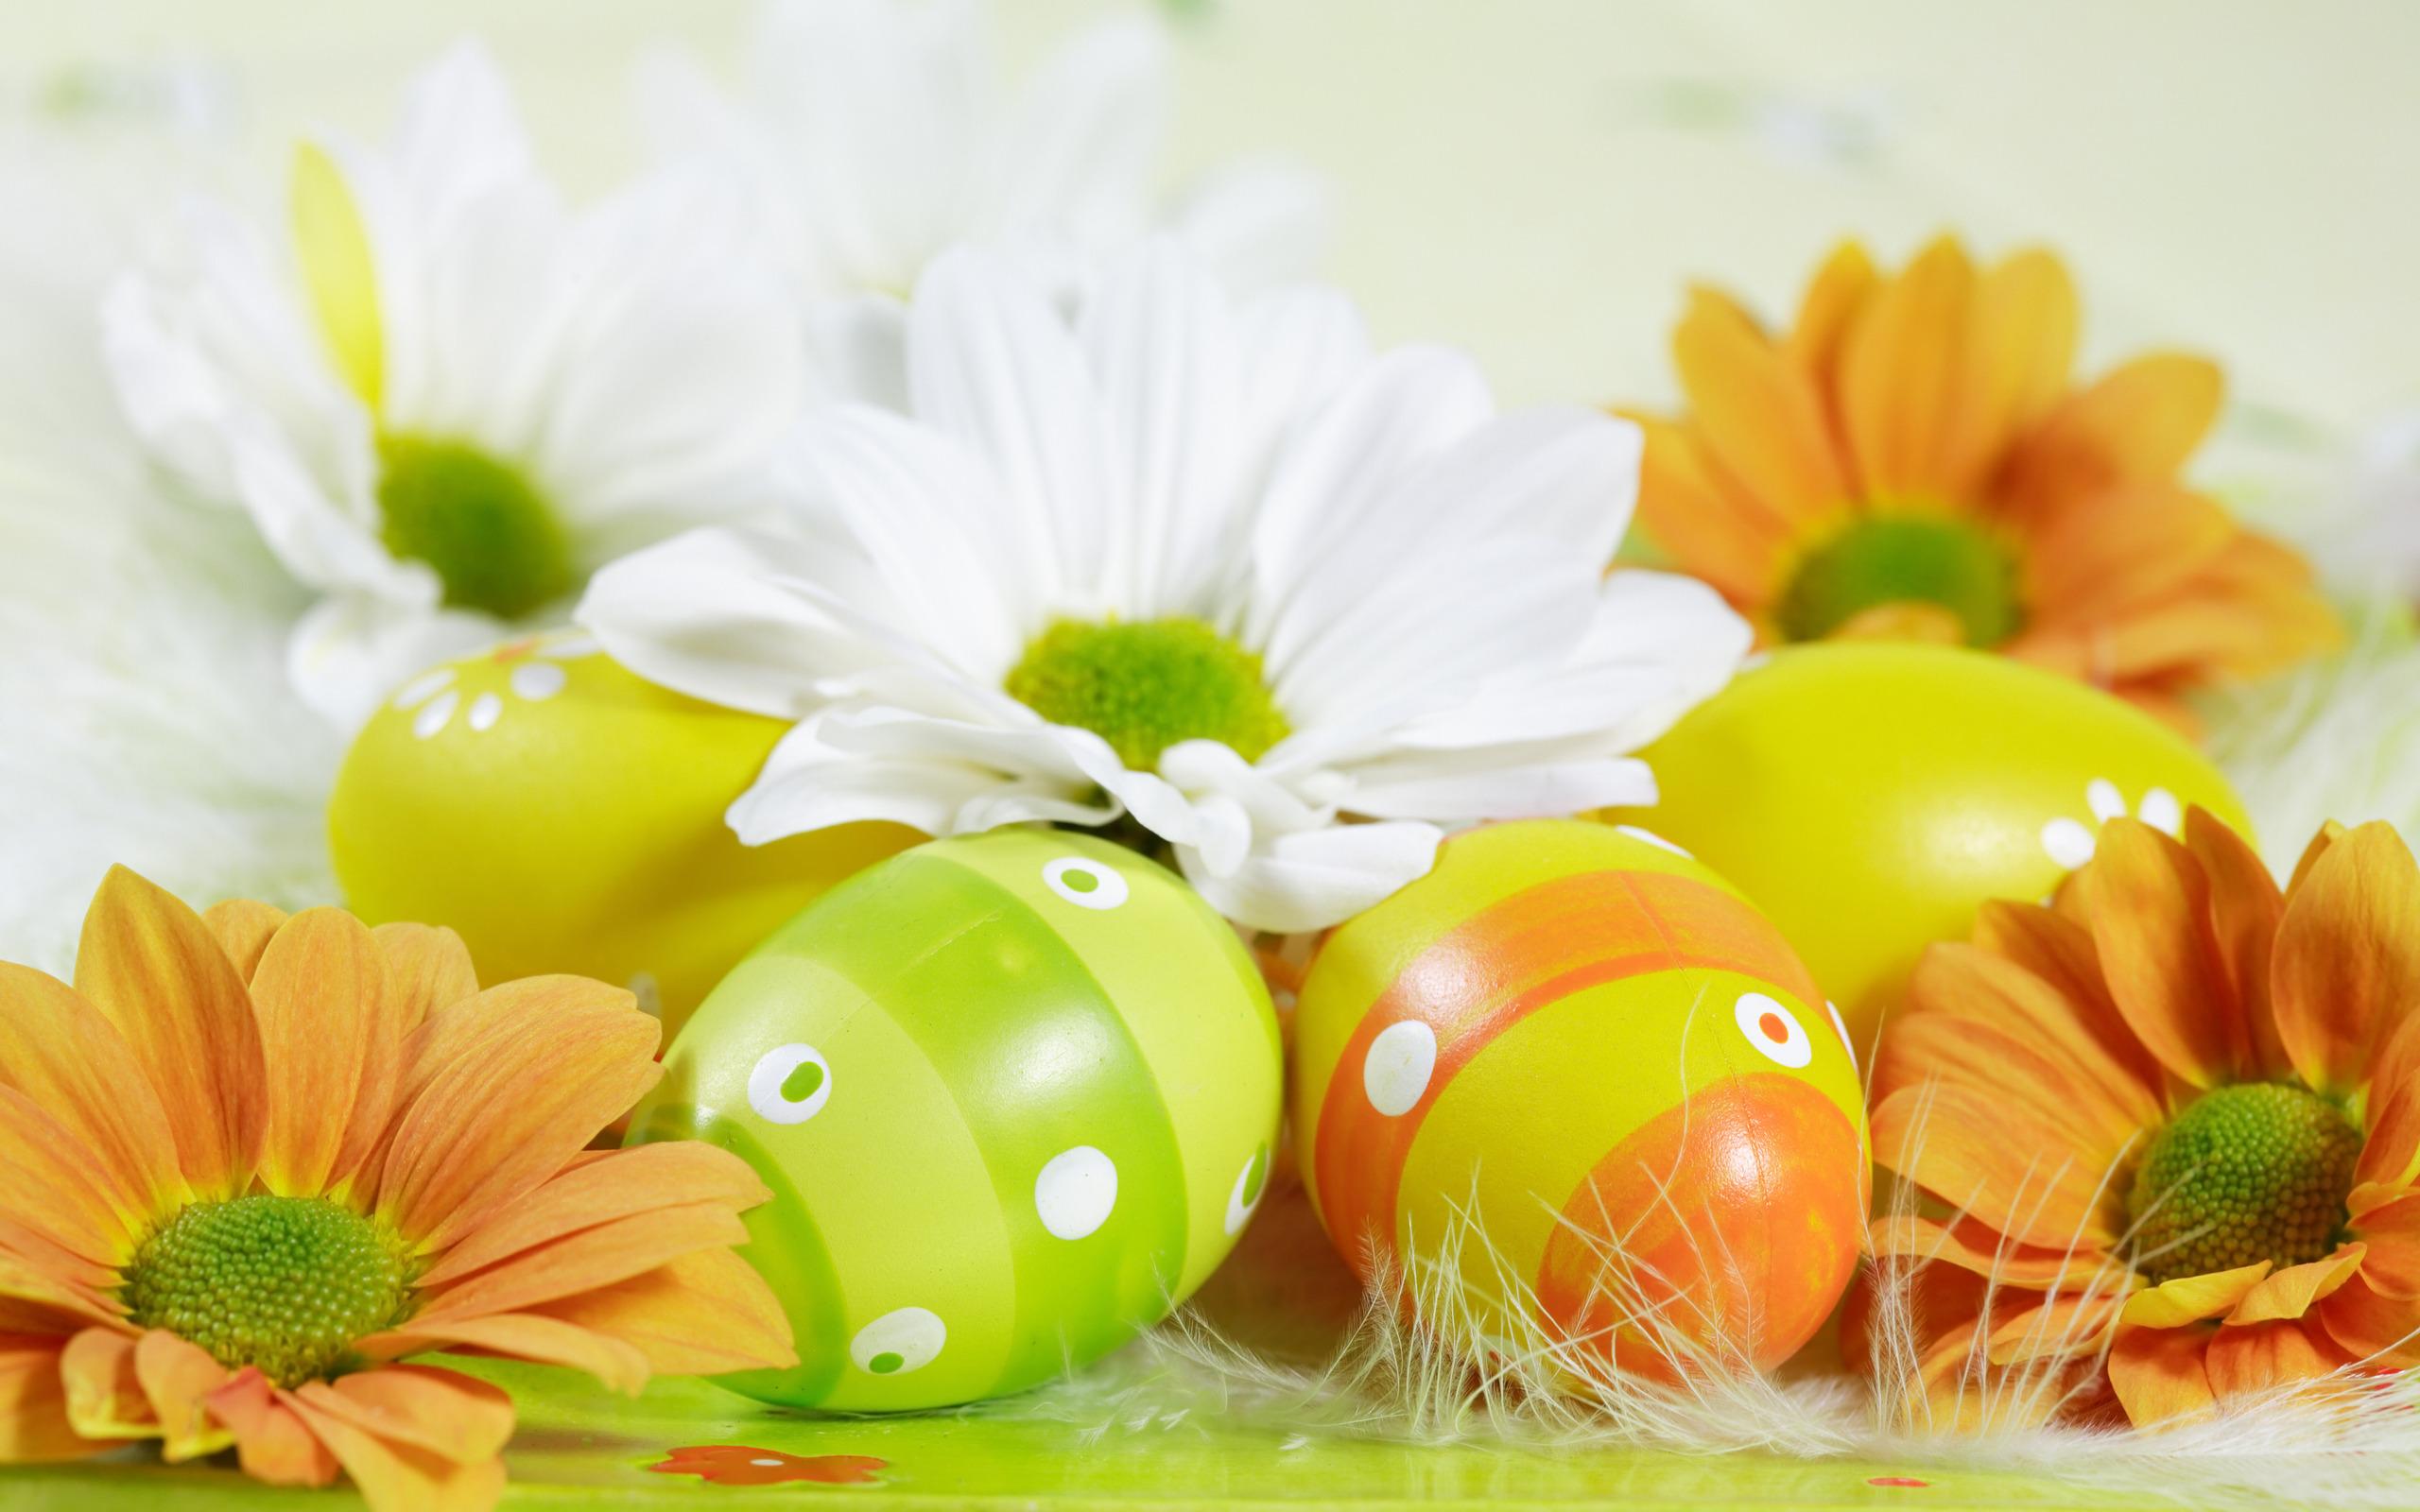 Easter eggs Desktop Wallpapers FREE on Latorocom 2560x1600